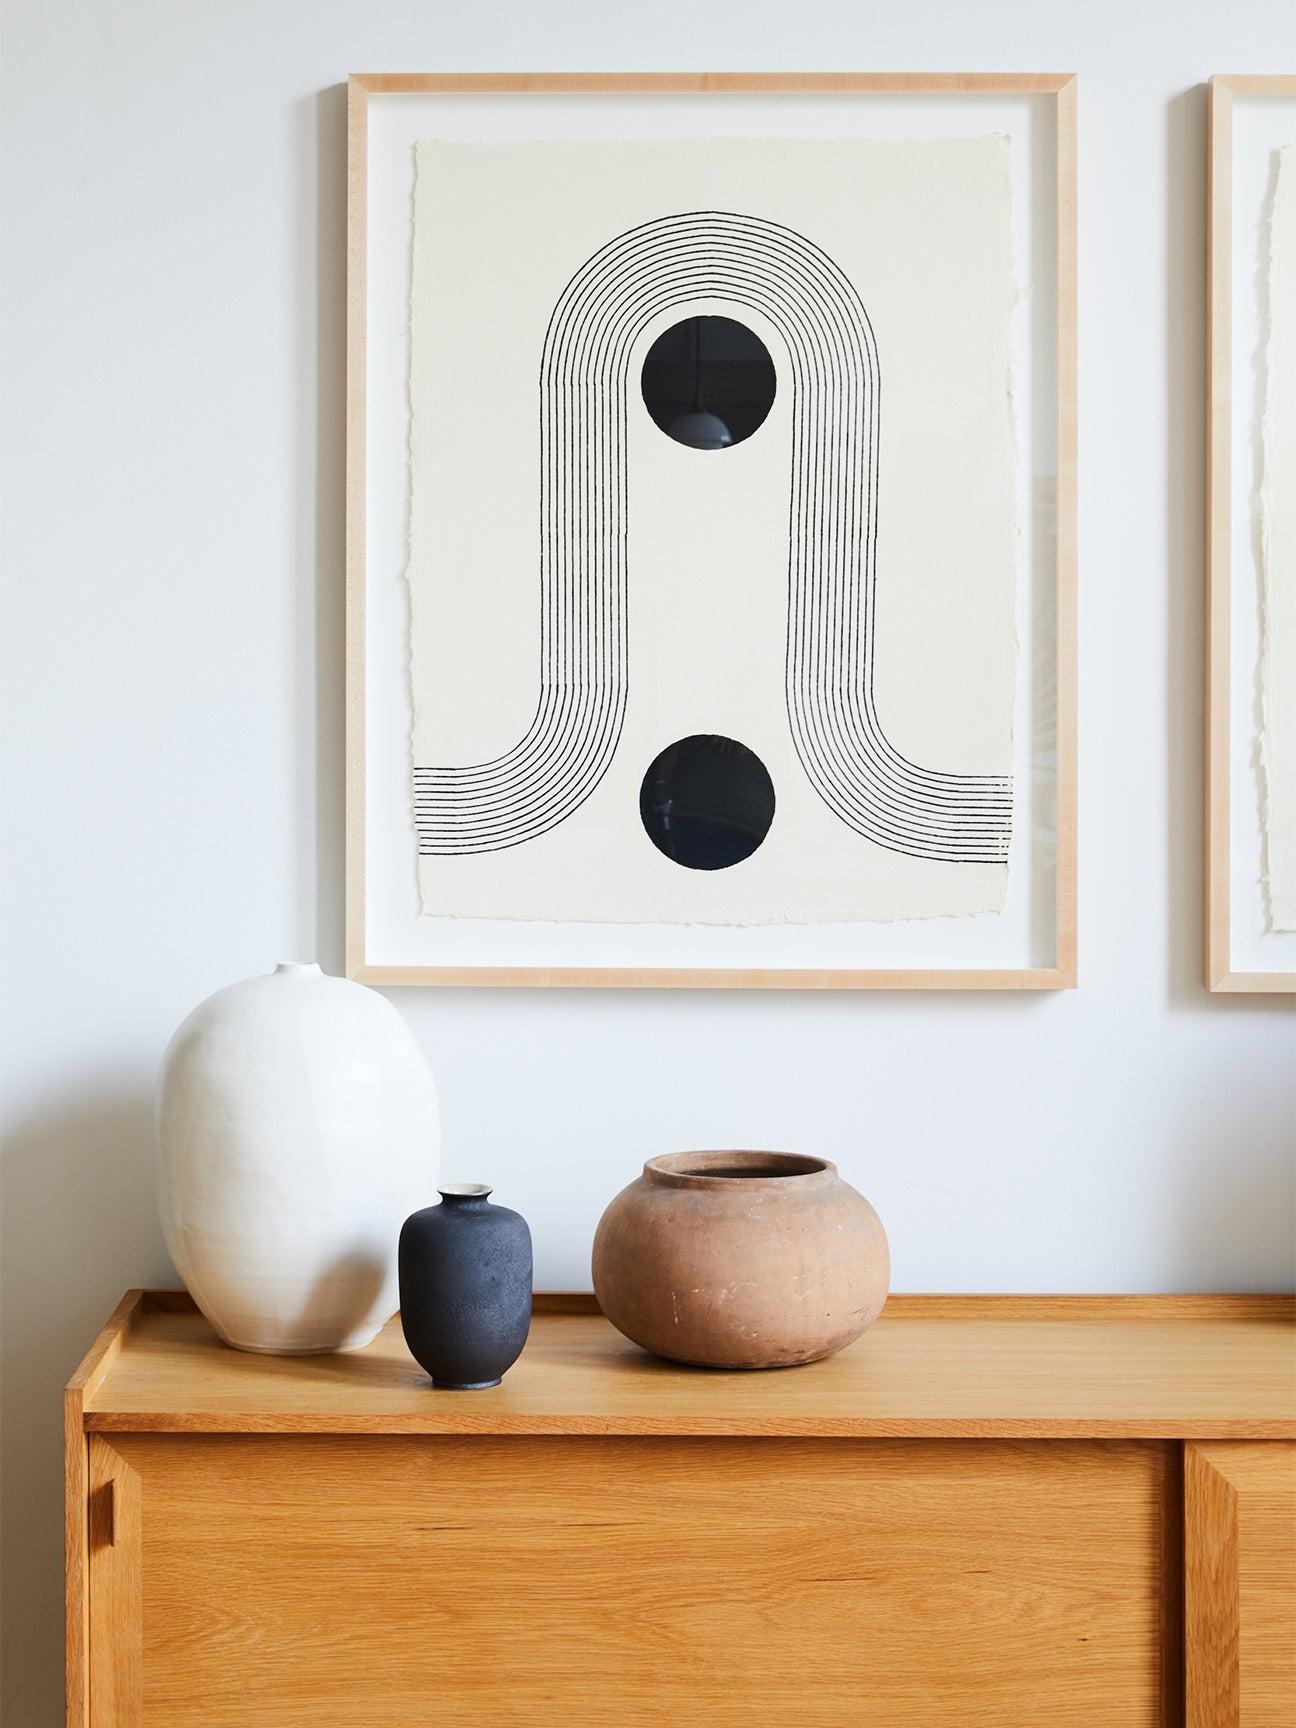 dresser with vases